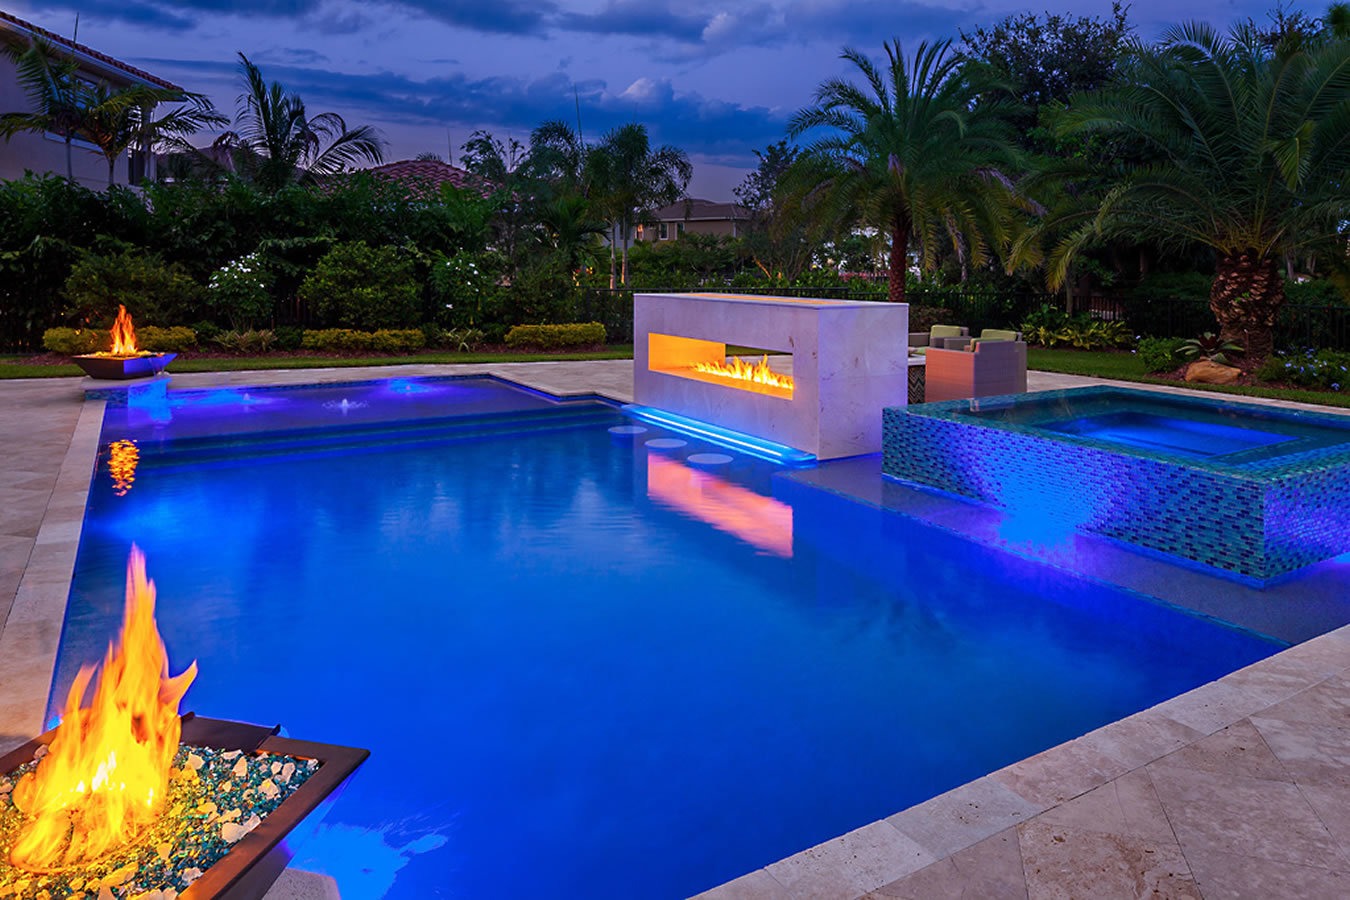 Trends in luxury pool design windermere community realty for Alderwood pool public swim times